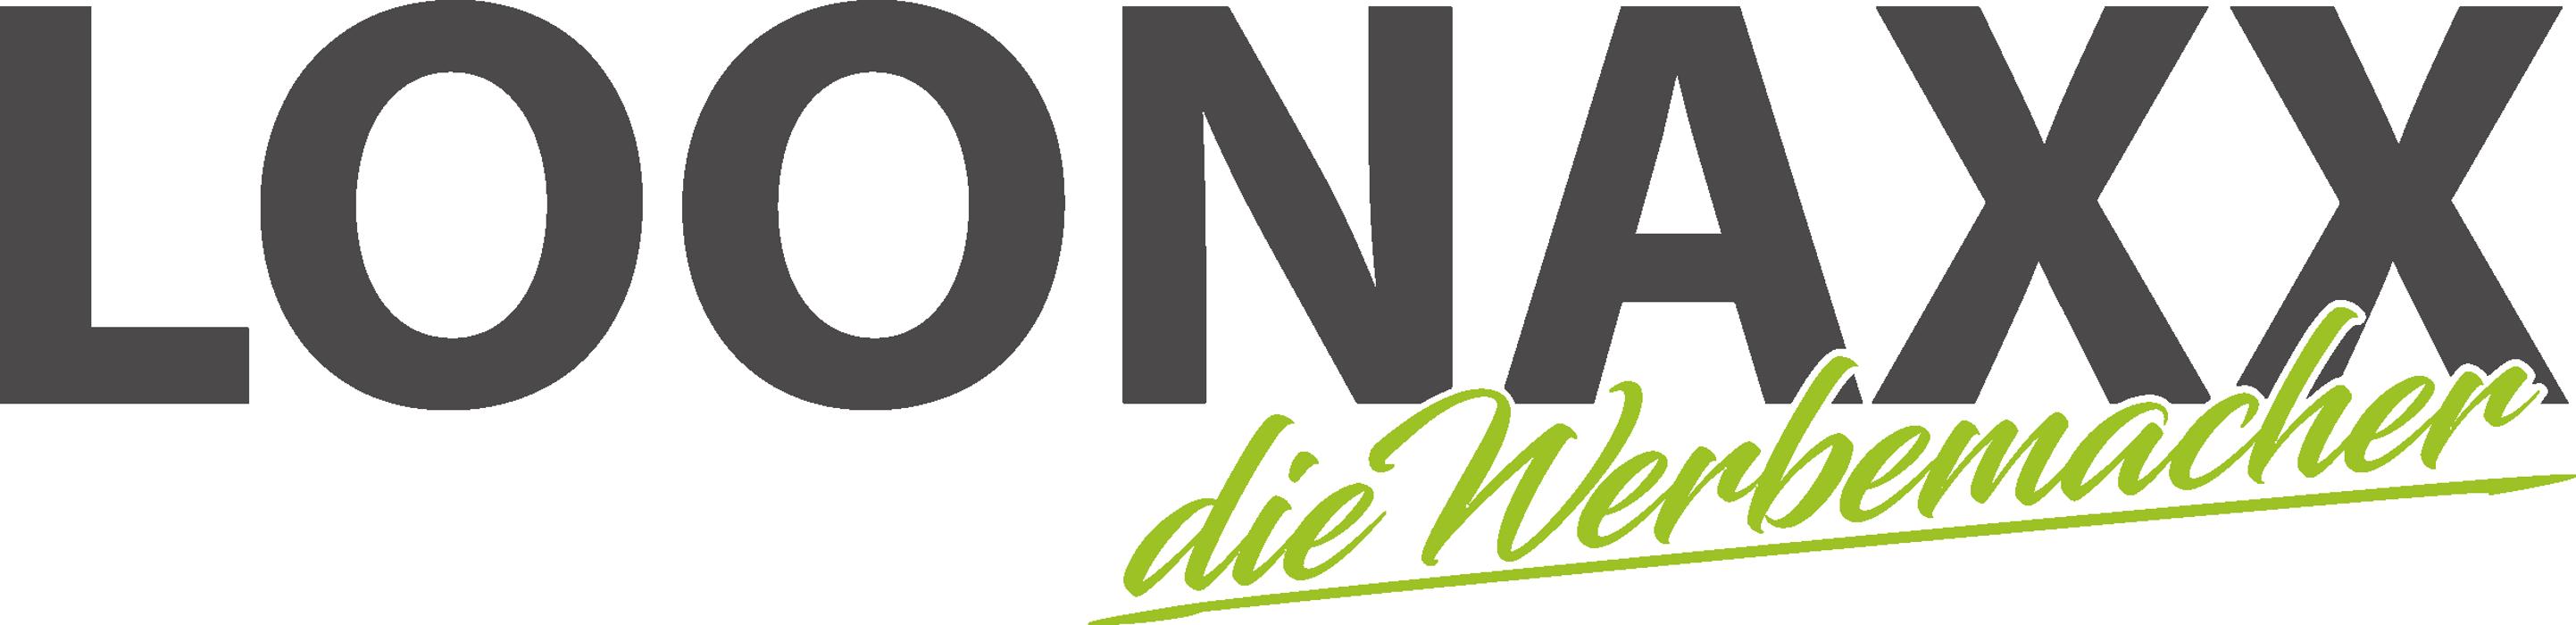 Bild zu Loonaxx GmbH in Böblingen